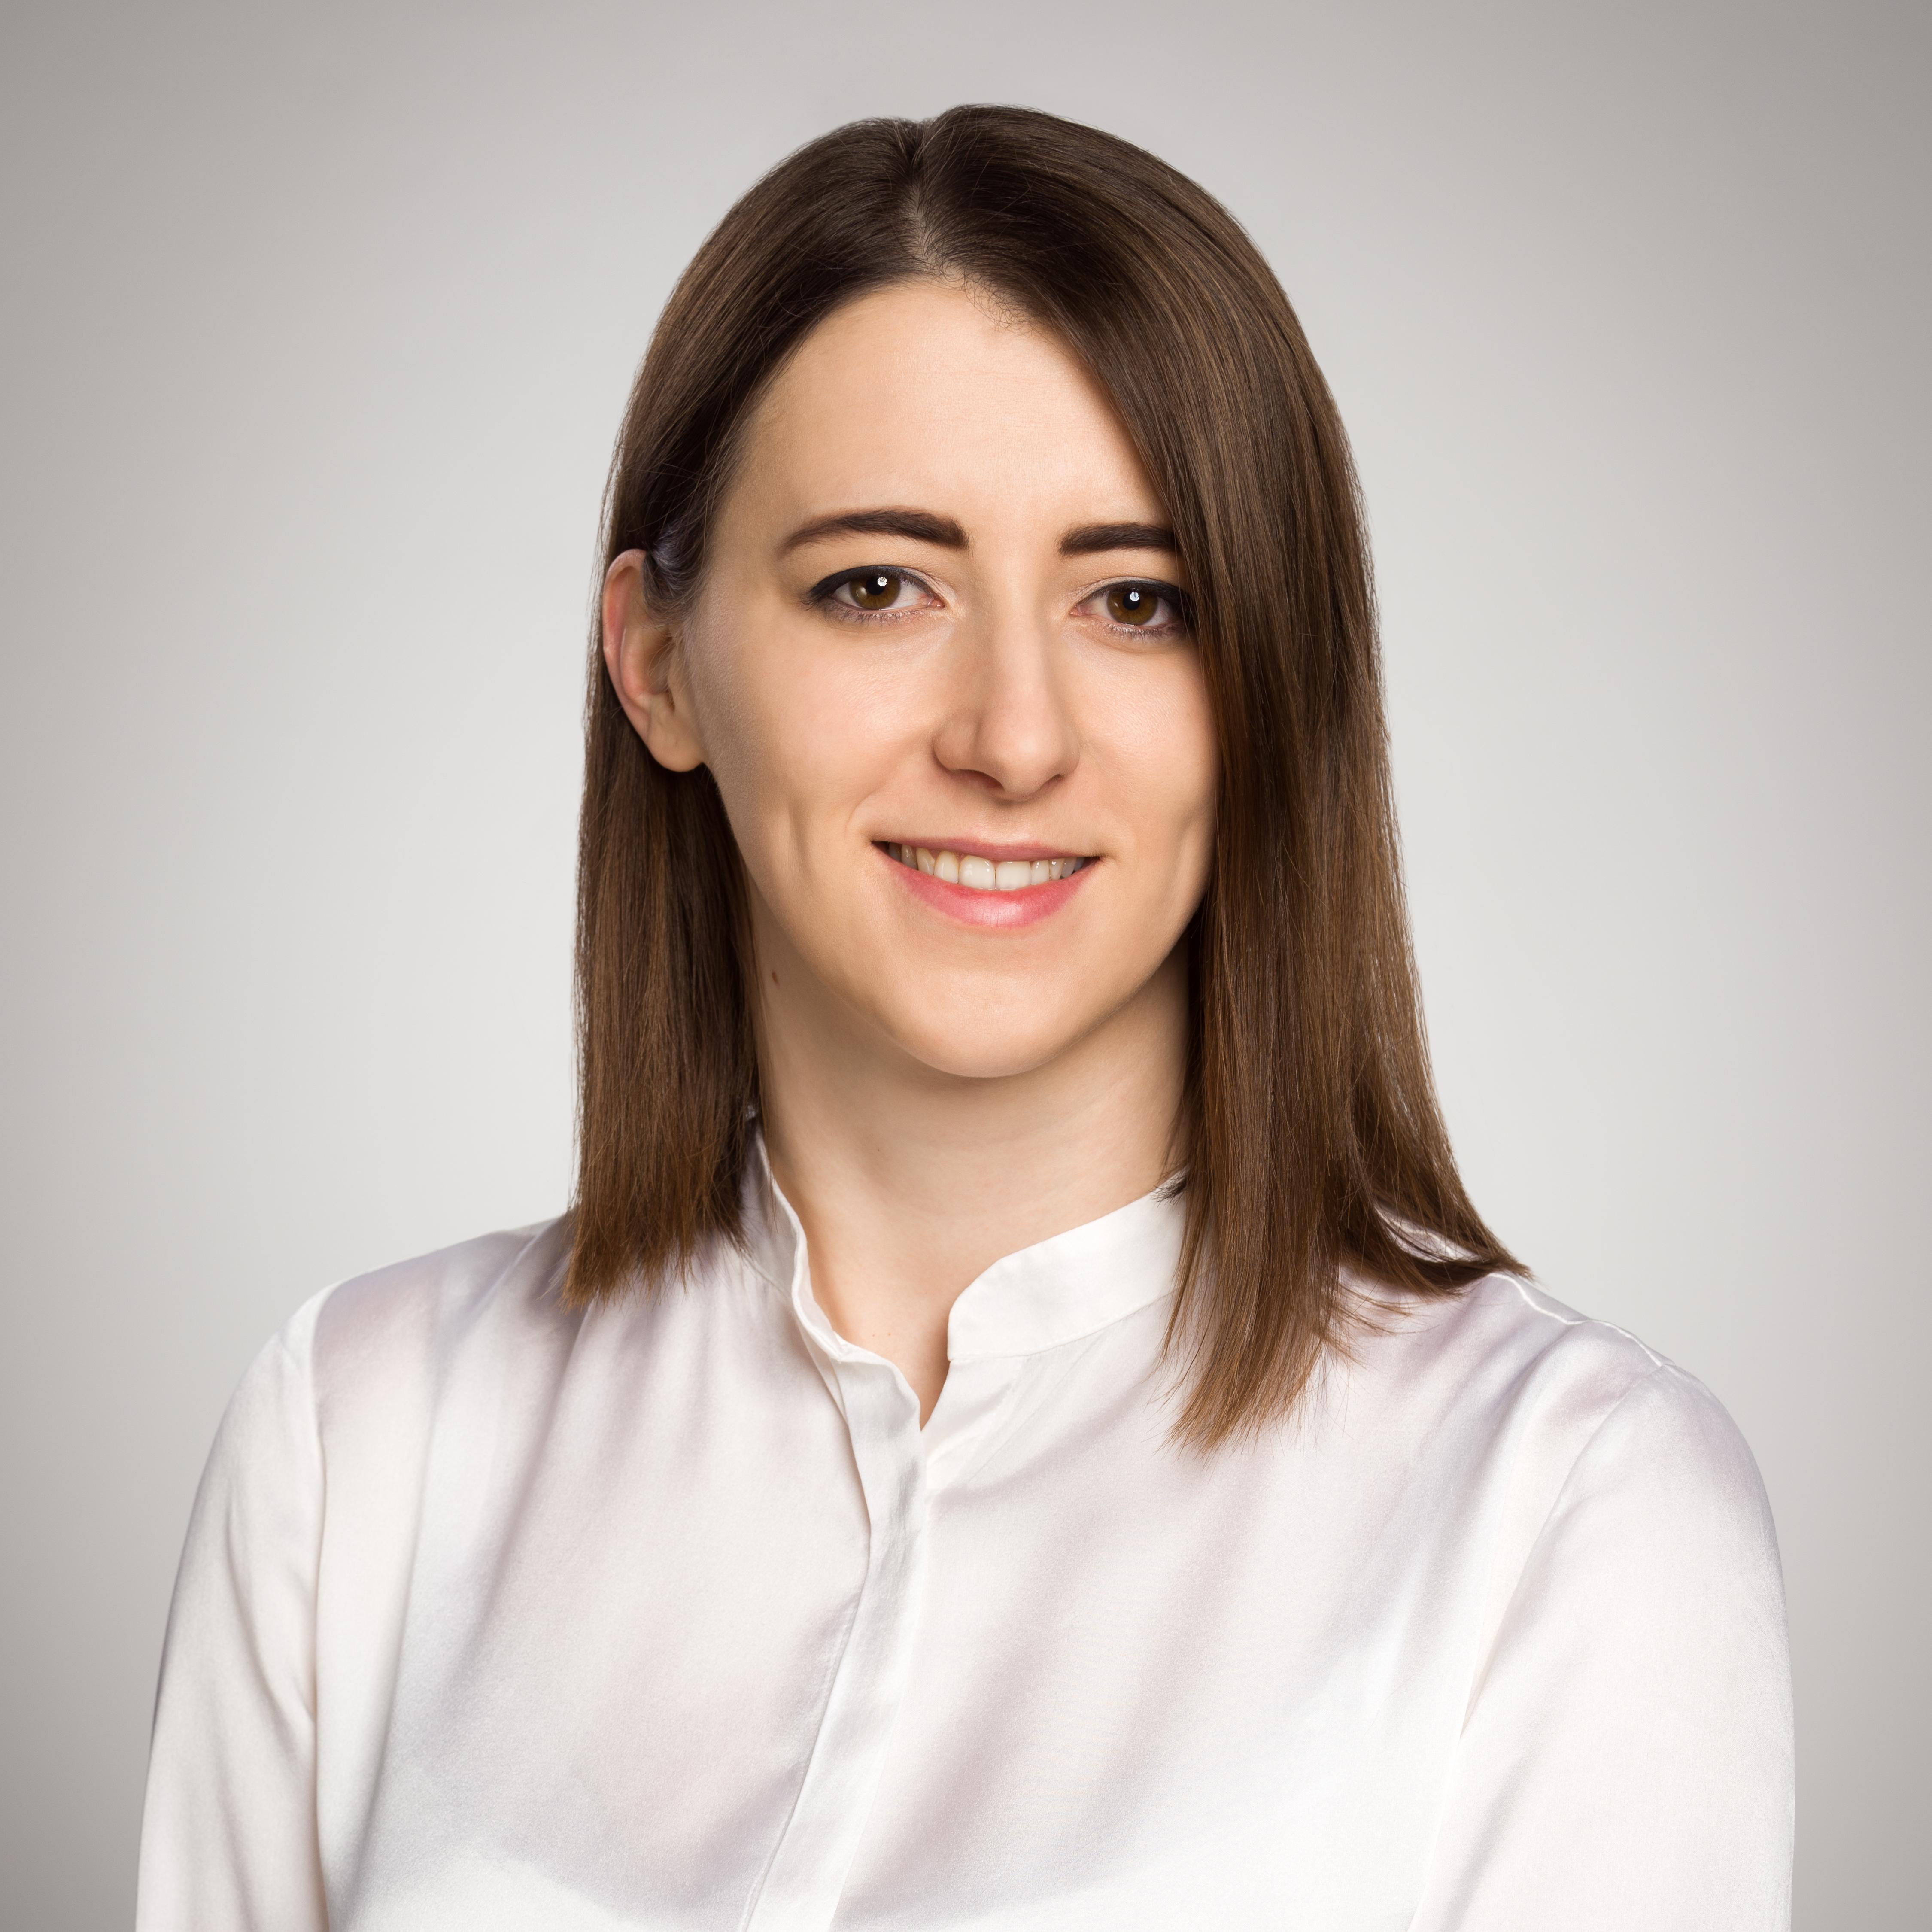 Marlena Tryka